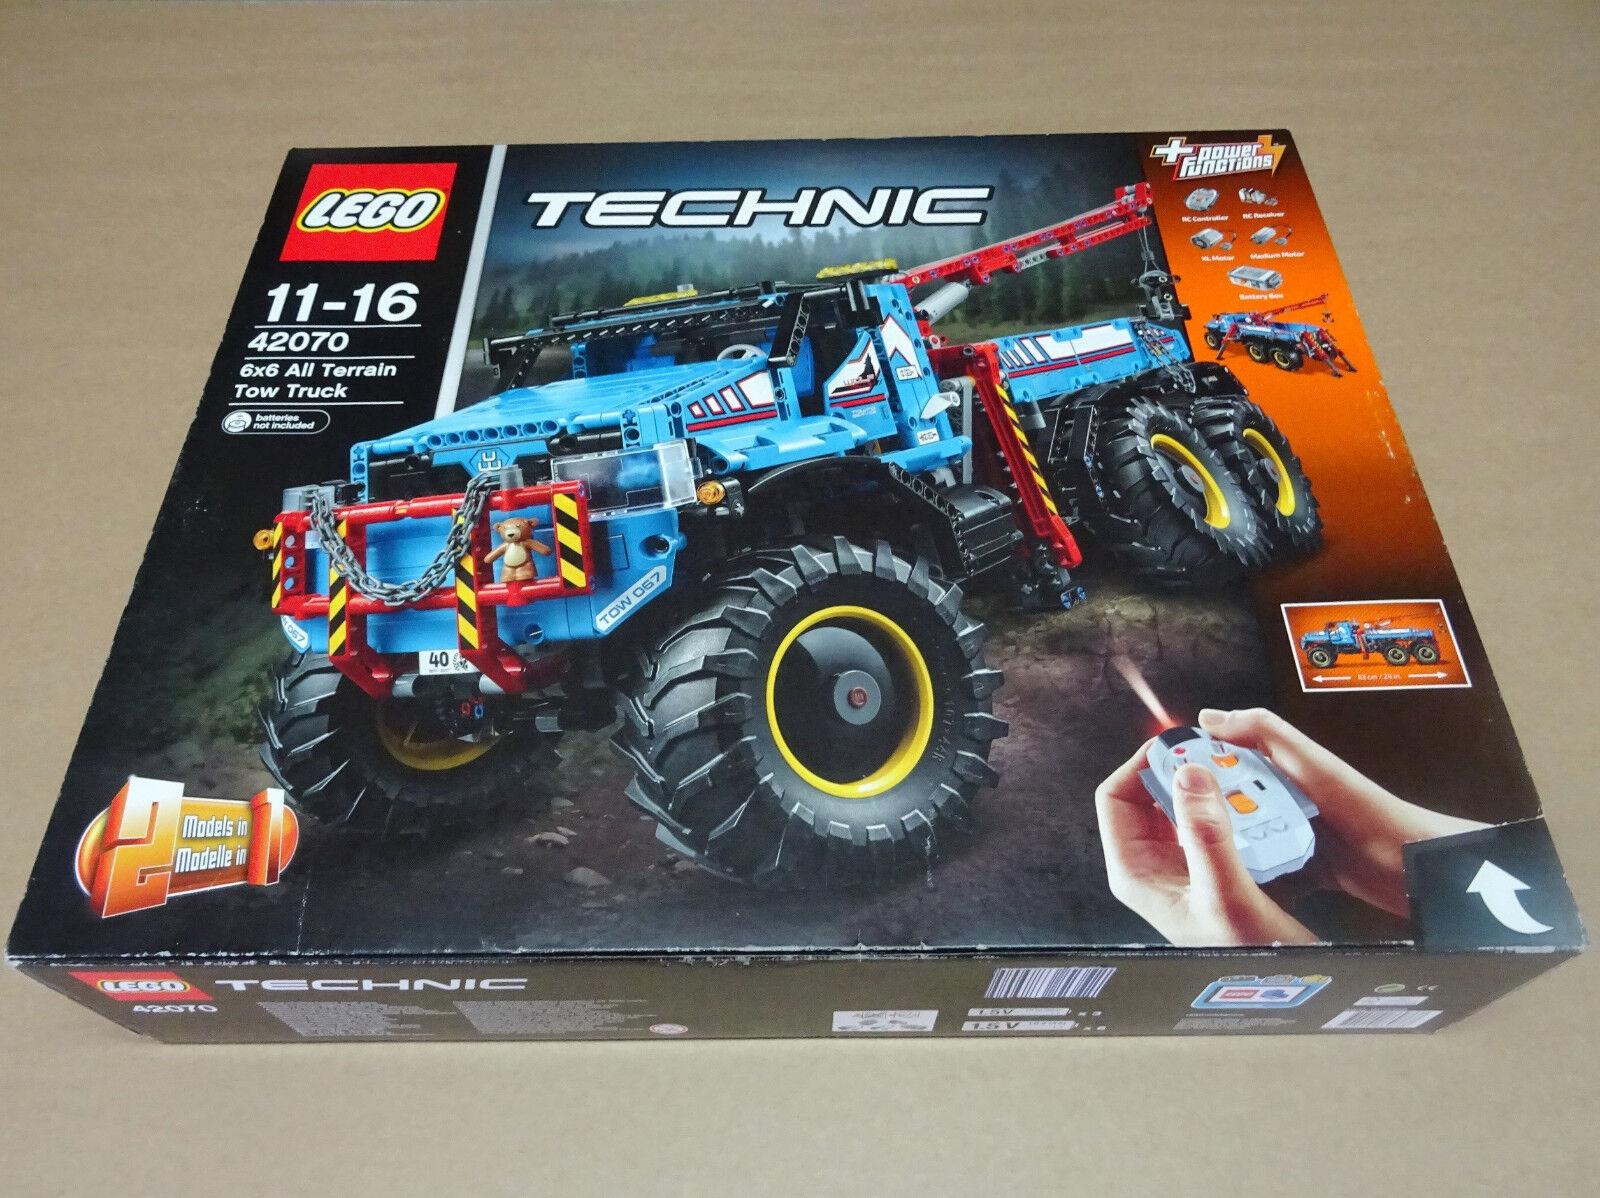 LEGO TECHNIC 6X6 ALL TERRAIN TOW TRUCK TRUCK TRUCK 42070 - NUEVO PRECINTADO SIN ABRIR 0b2efd